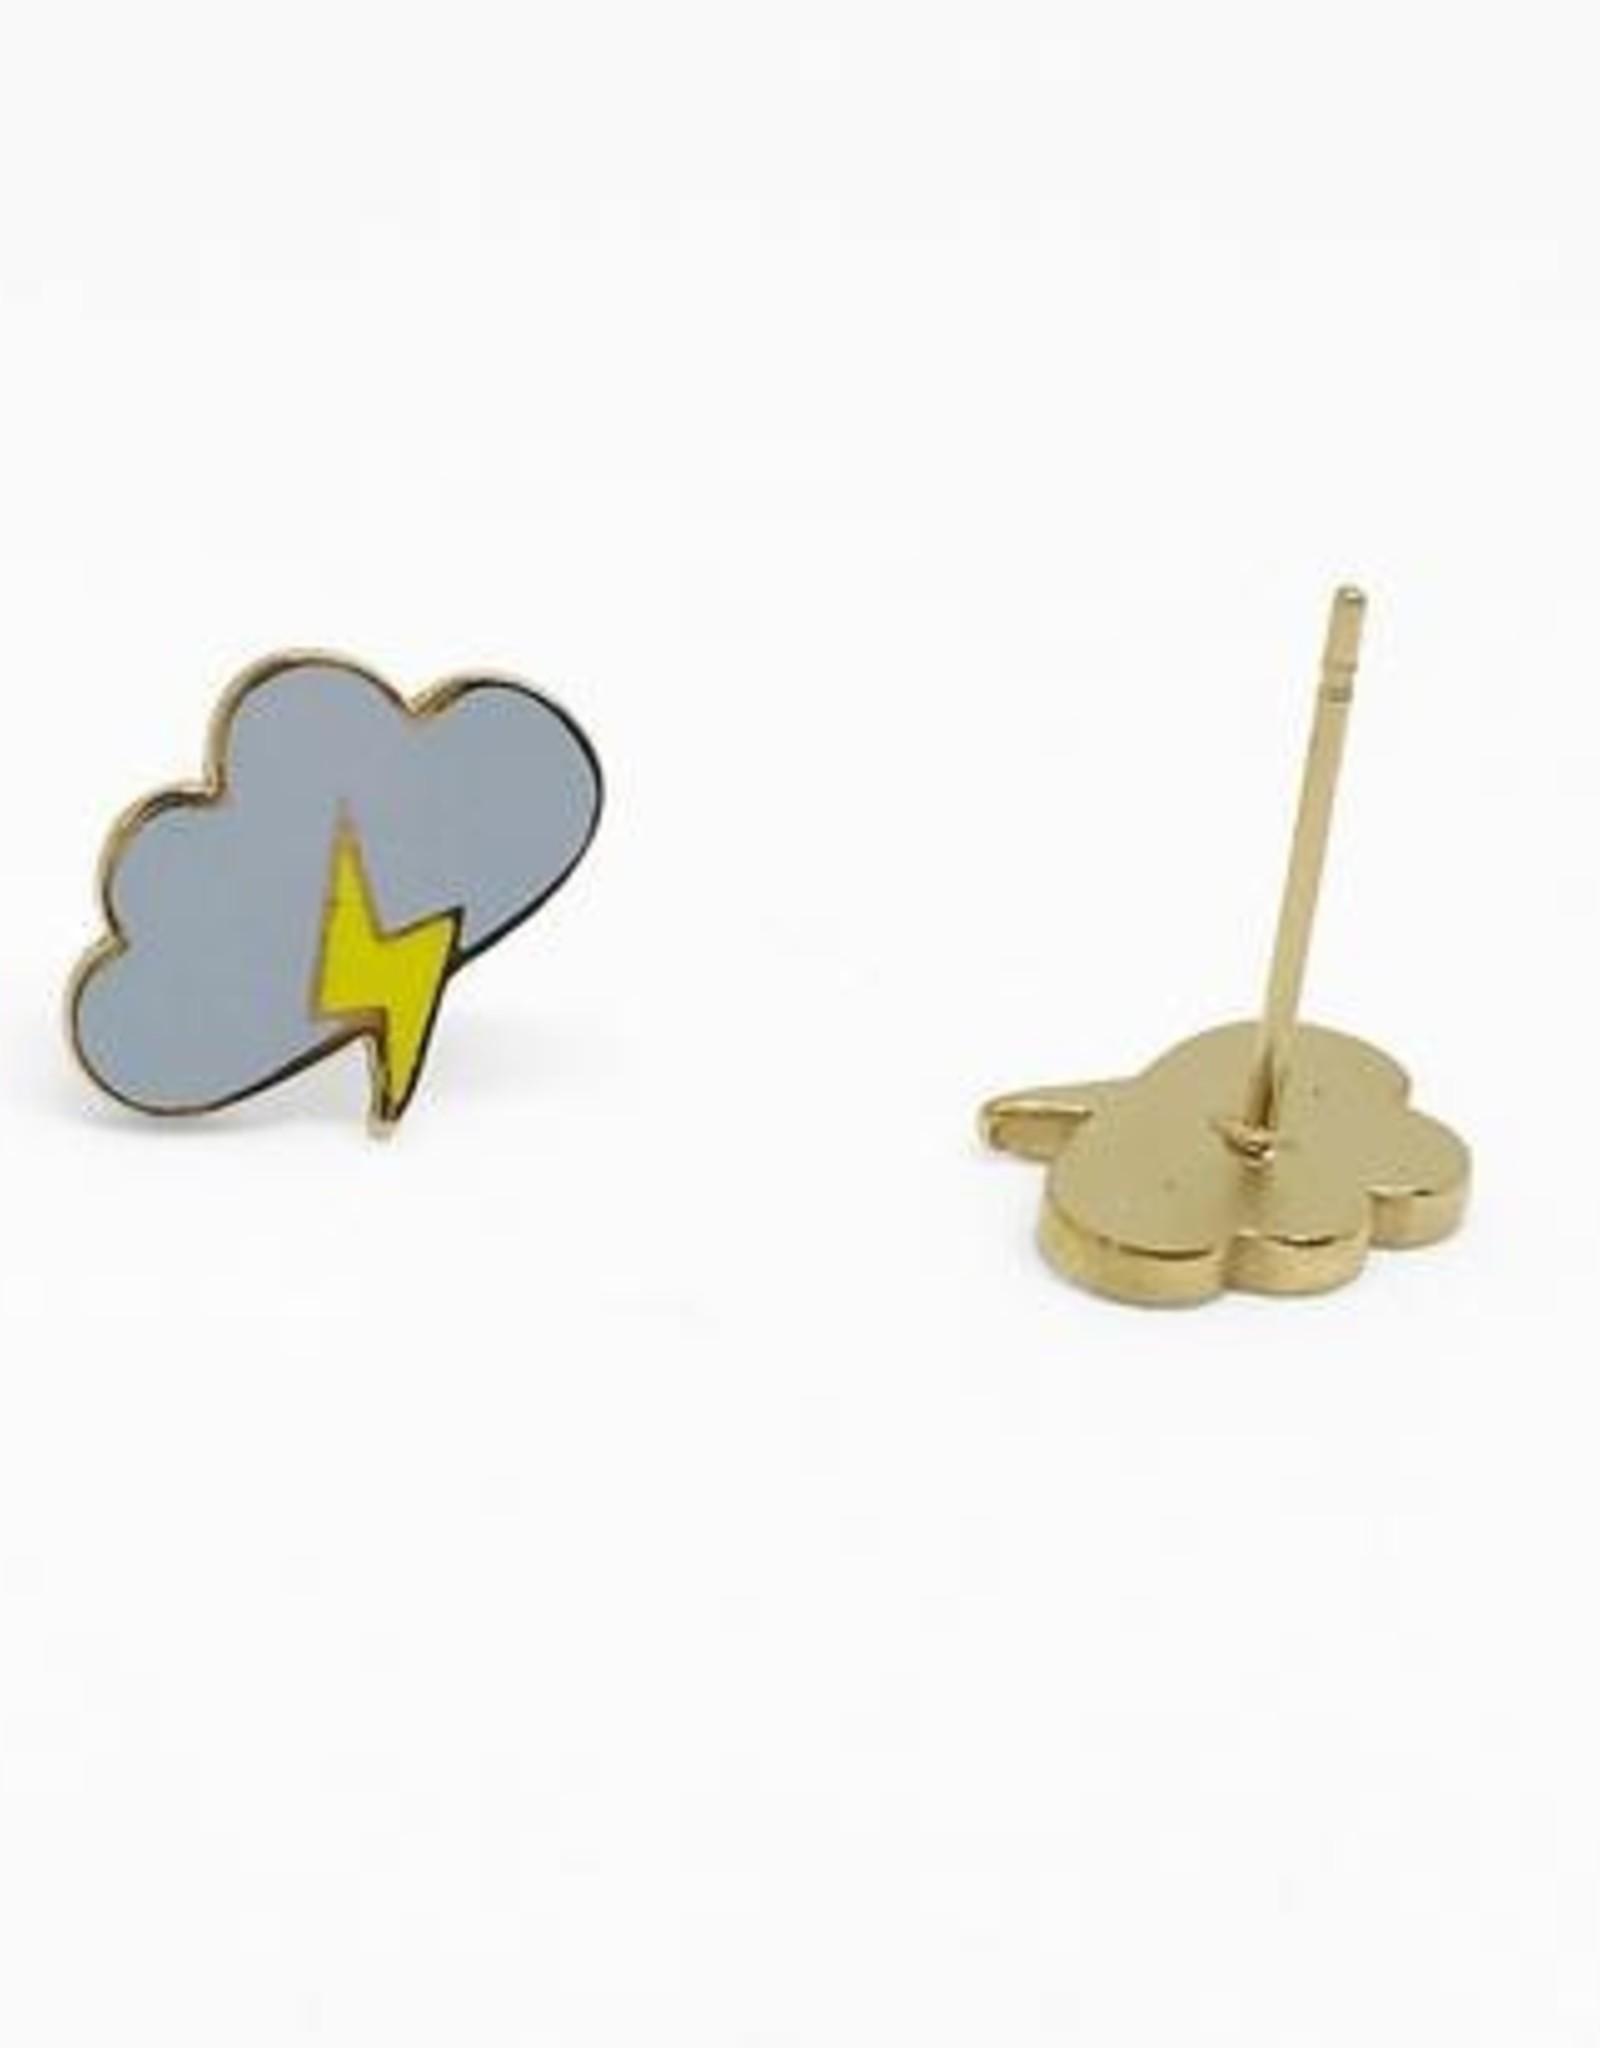 Sleepy Mountain Lightning Cloud Earrings // Gold Plated